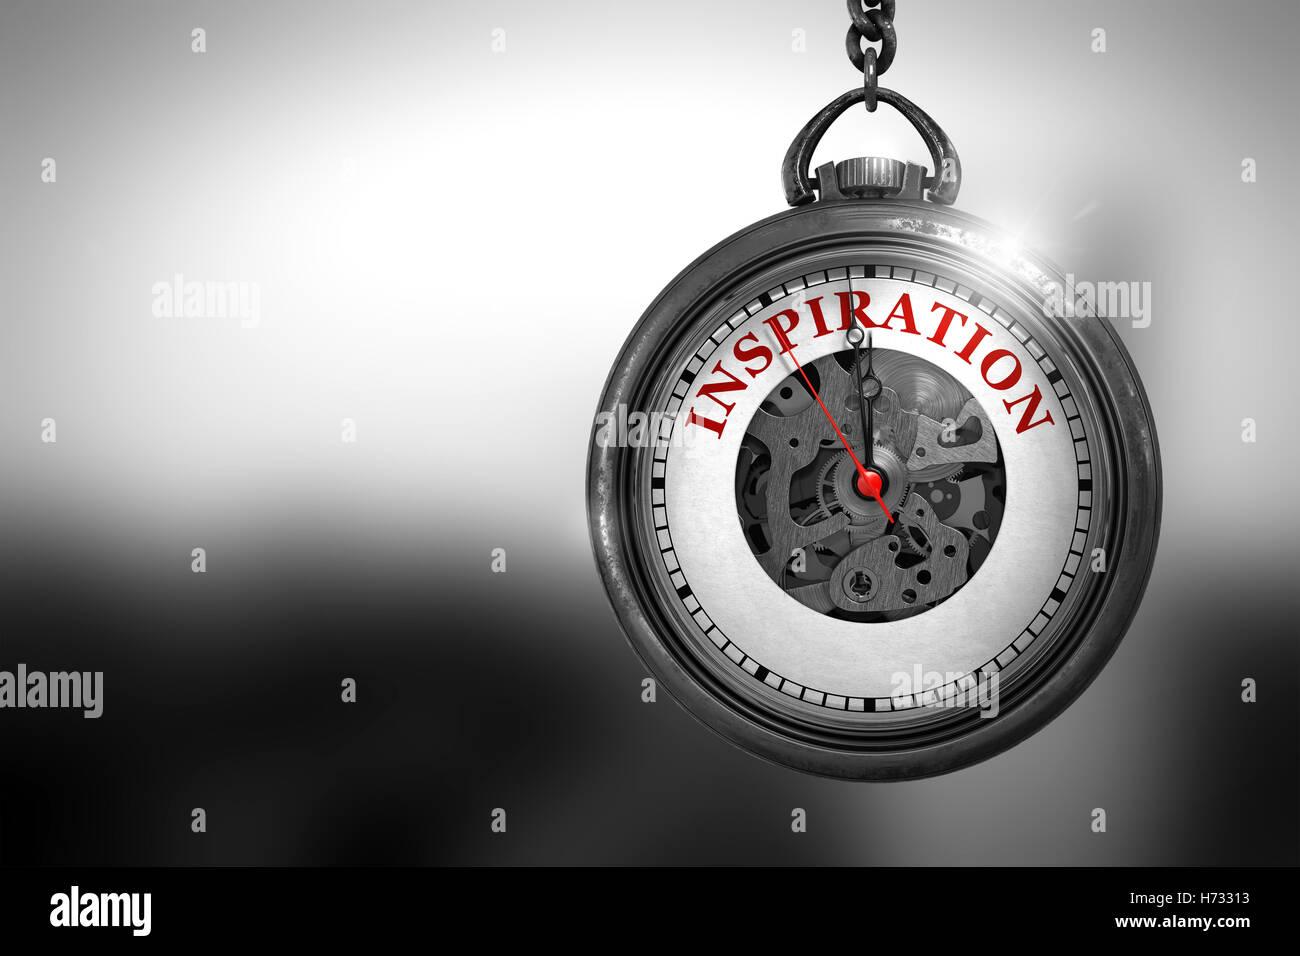 Inspiration auf Taschenuhr. 3D Illustration. Stockbild